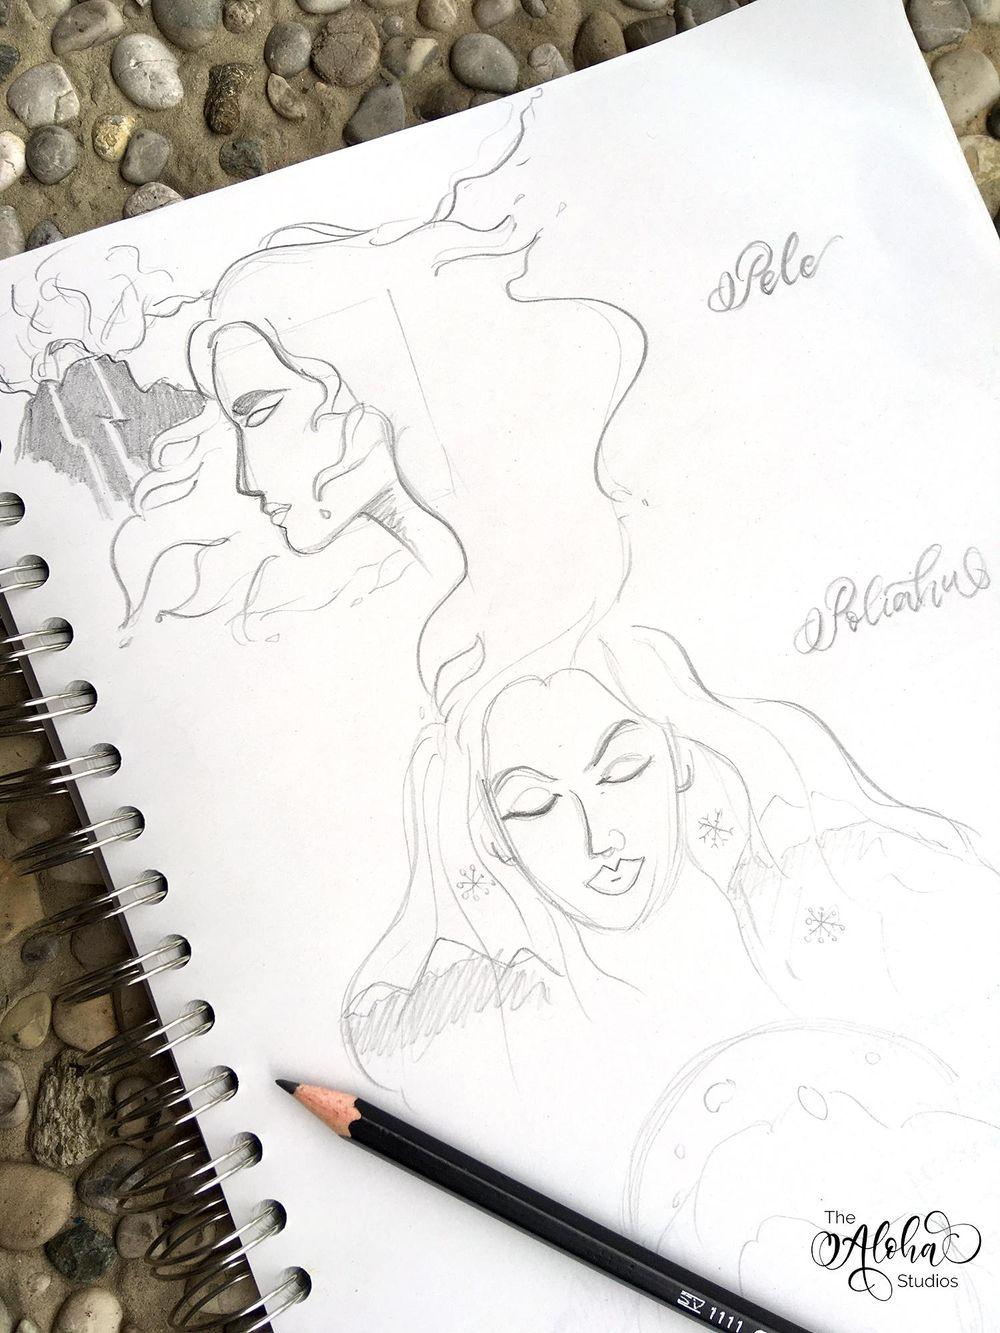 Hawaiian watercolor goddesses, work process - image 2 - student project